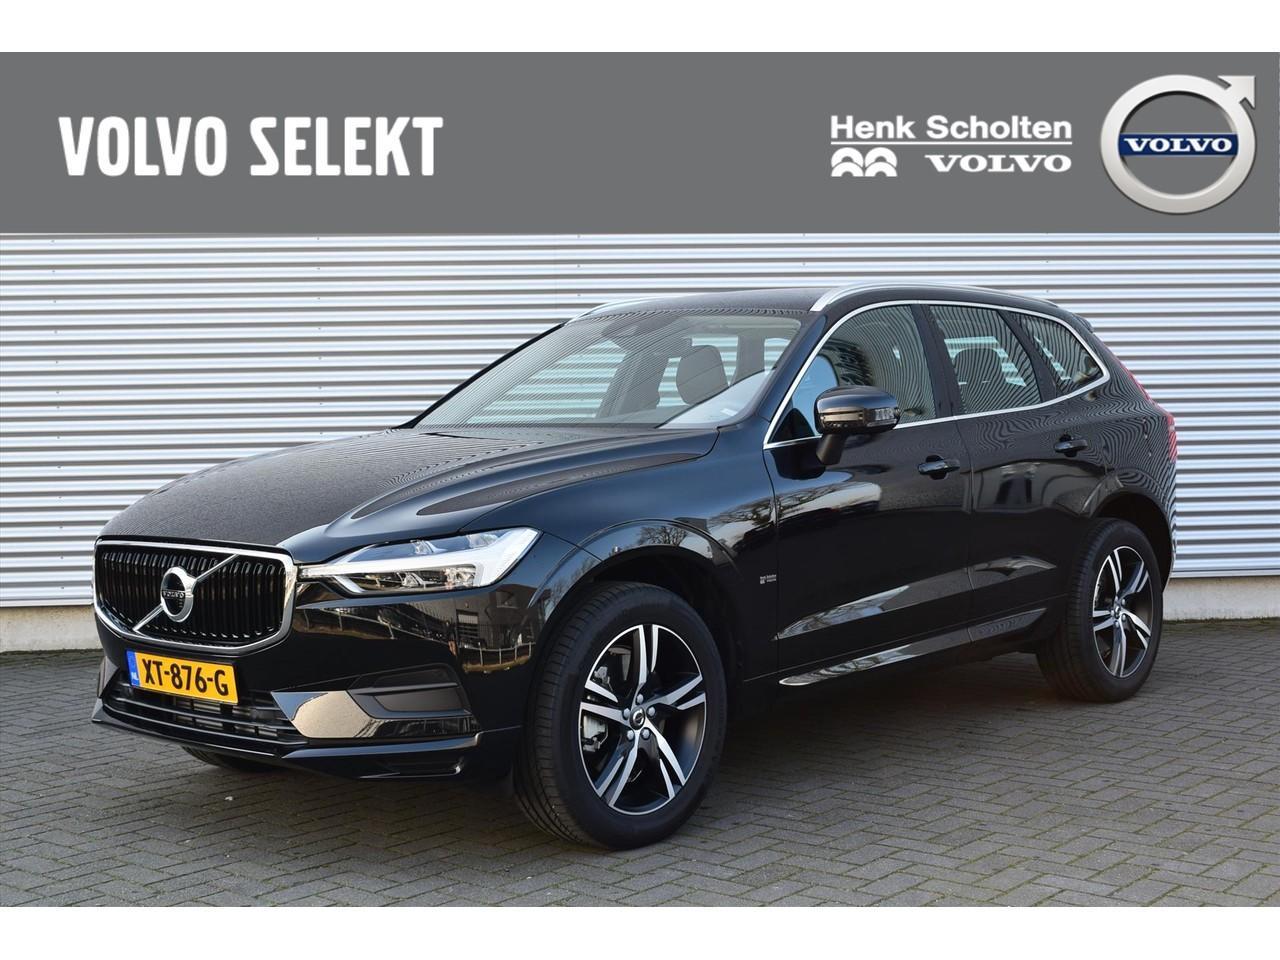 Volvo Xc60 New t5 250pk aut(8) momentum intellisafe leder